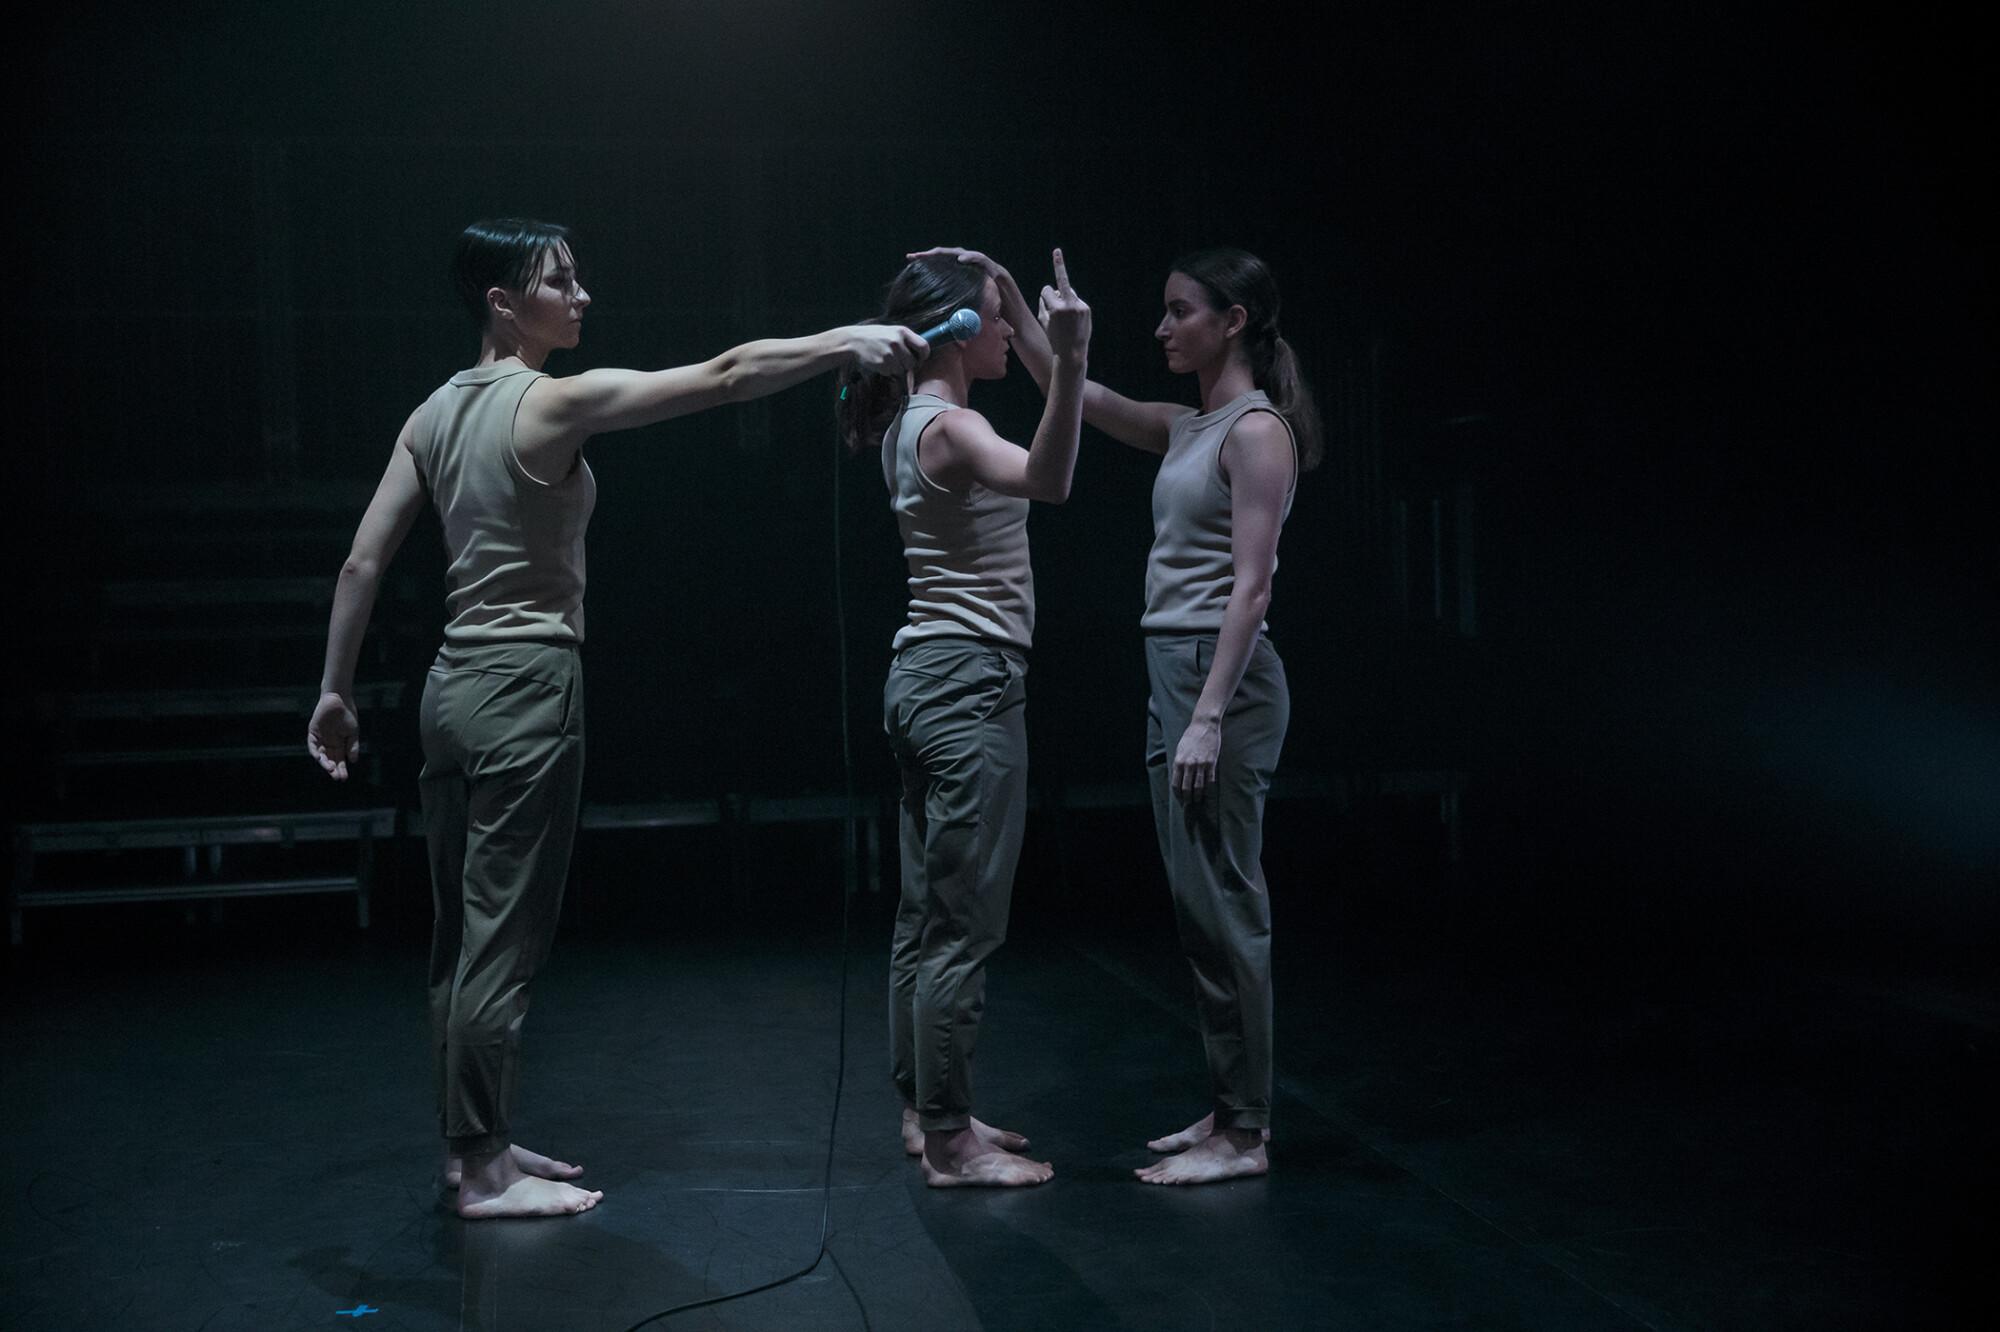 'Bodylex' (2021), Rhys Ryan. Photo by James Lauritz.